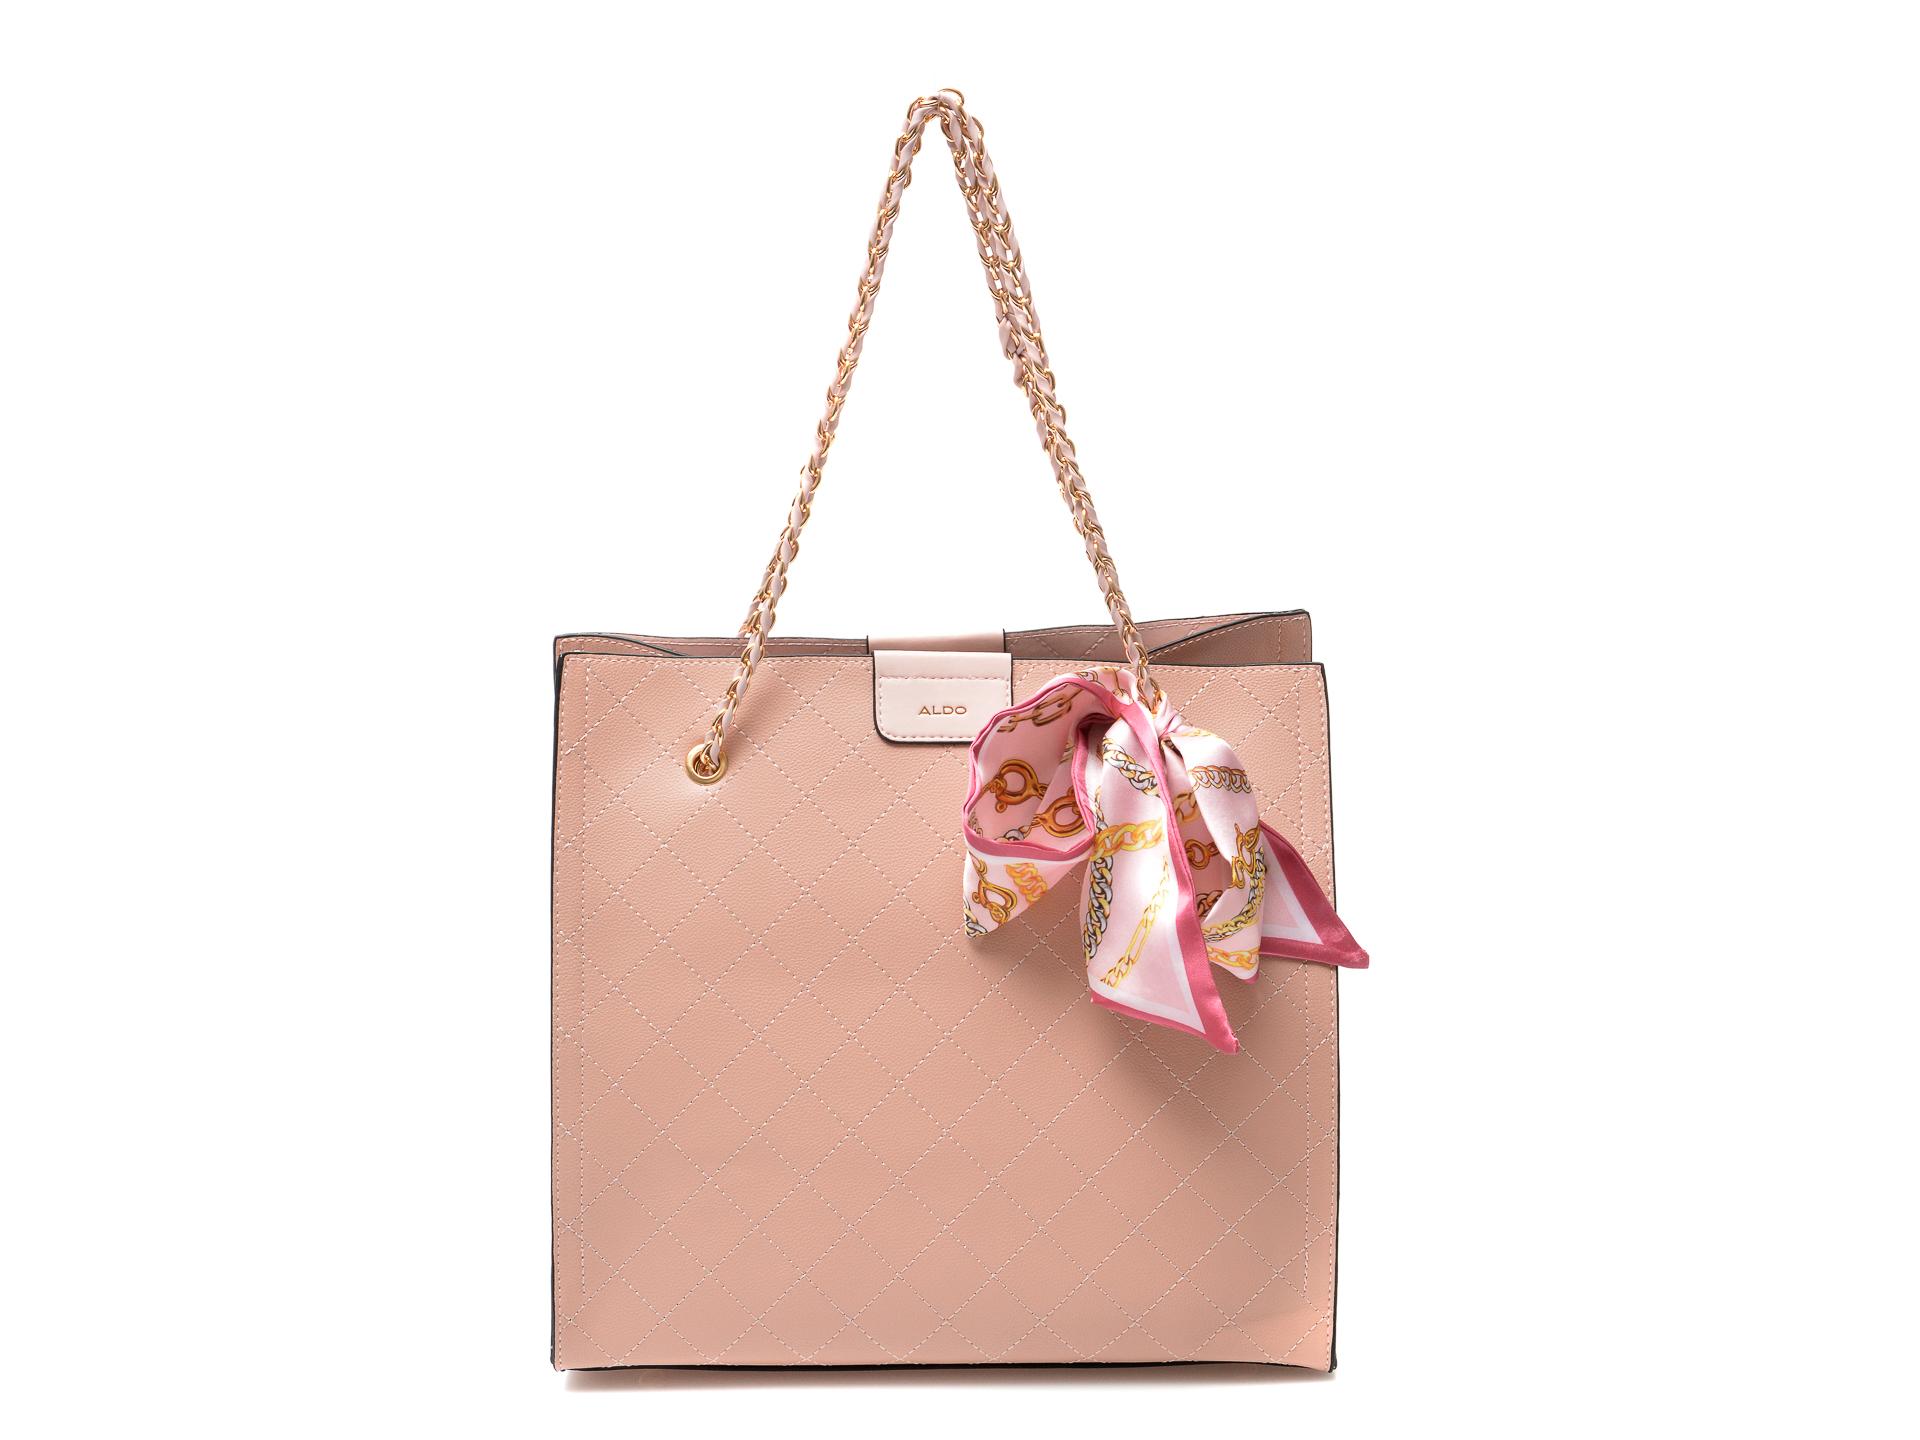 Poseta ALDO roz, Deganwy680, din piele ecologica imagine otter.ro 2021